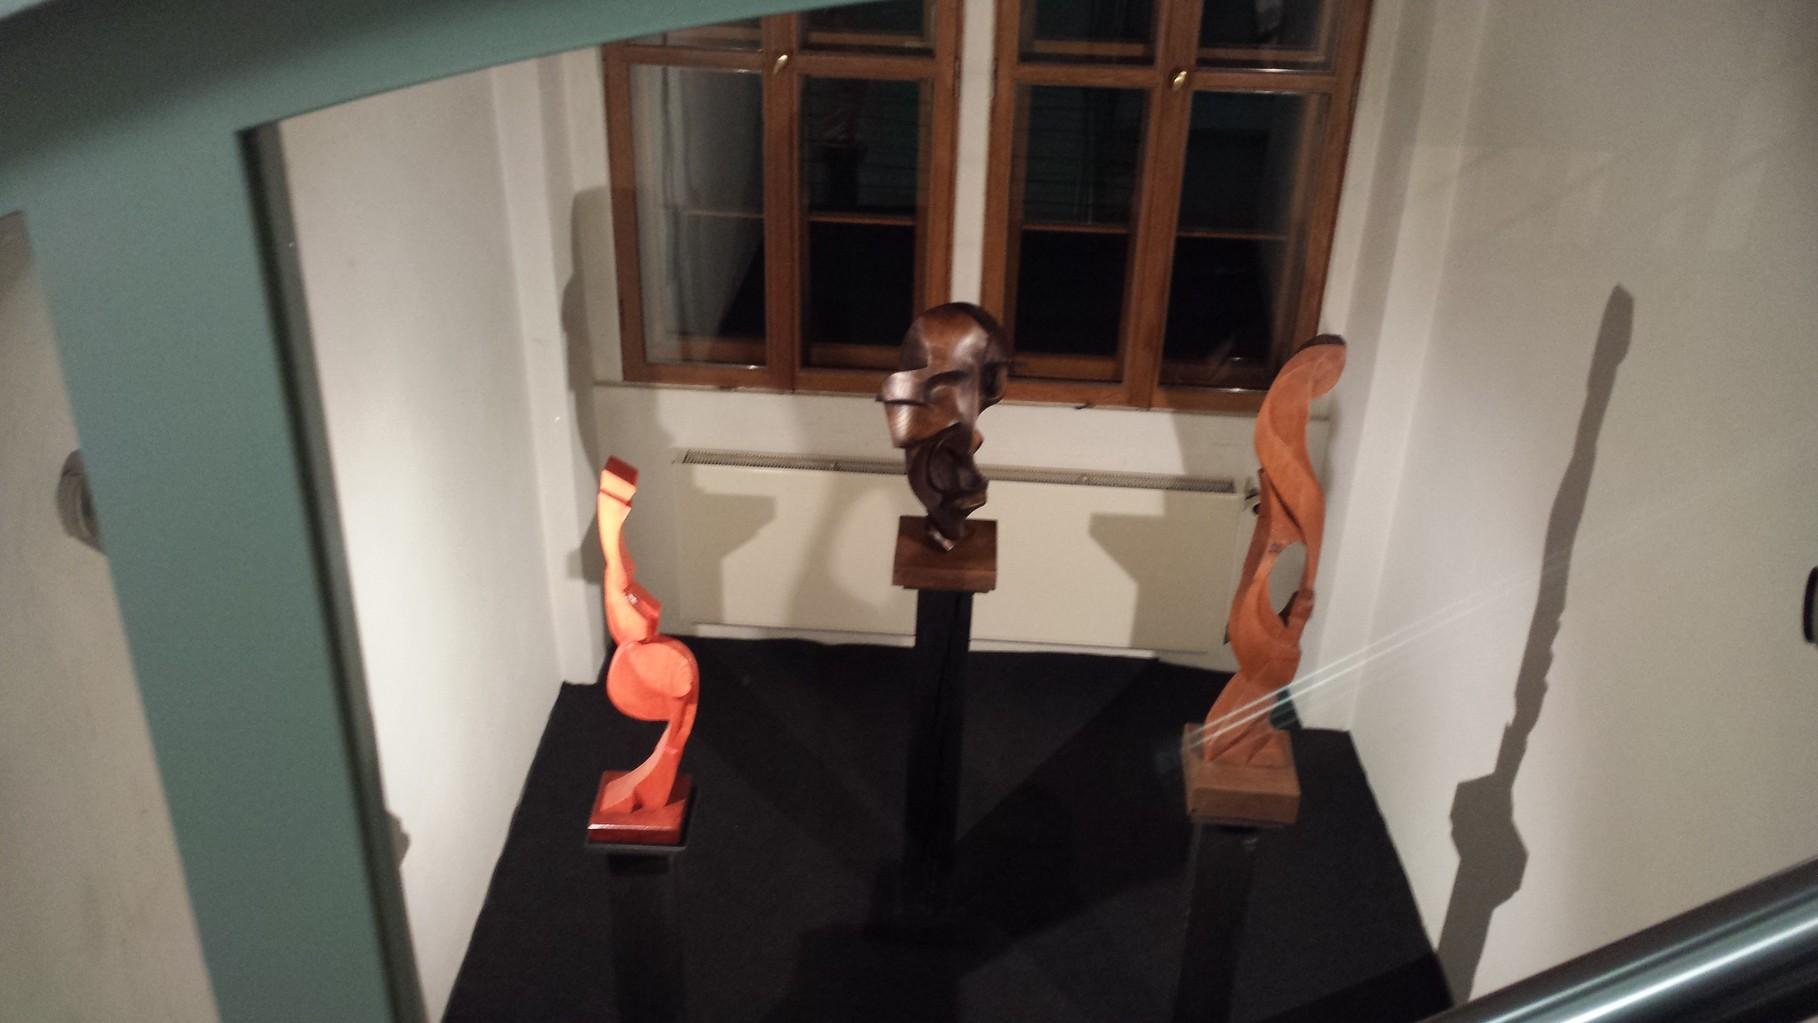 Art Leben im Holz beteiligt sich an der Kunstausstellung im Wasserschloss Kaffenbach bei Chemnitz